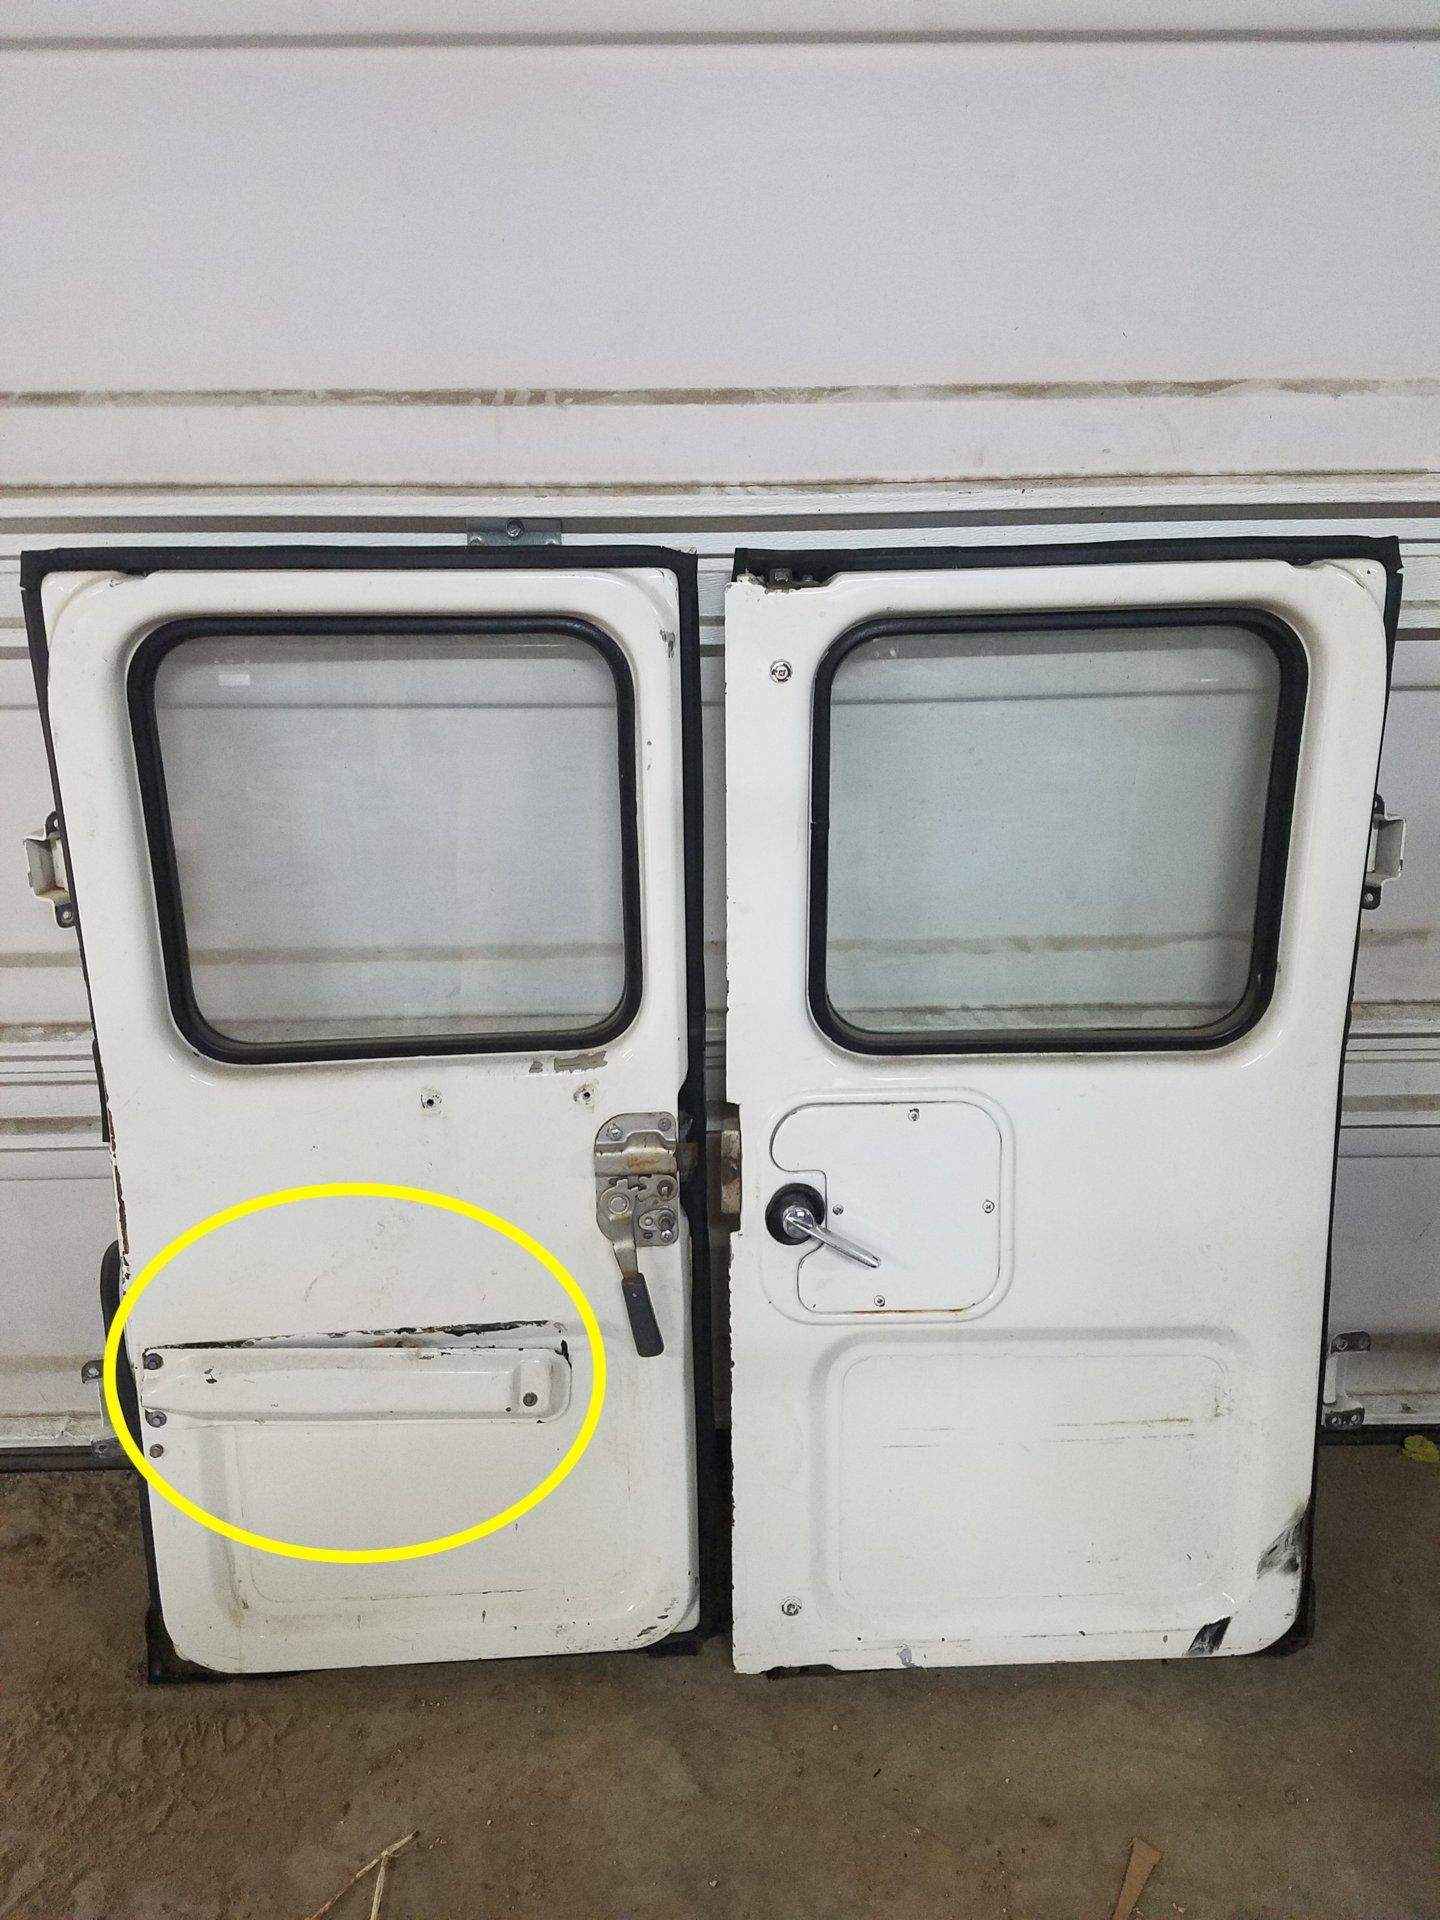 FJ40 1983 Ambulance Door Wire Cover.jpg